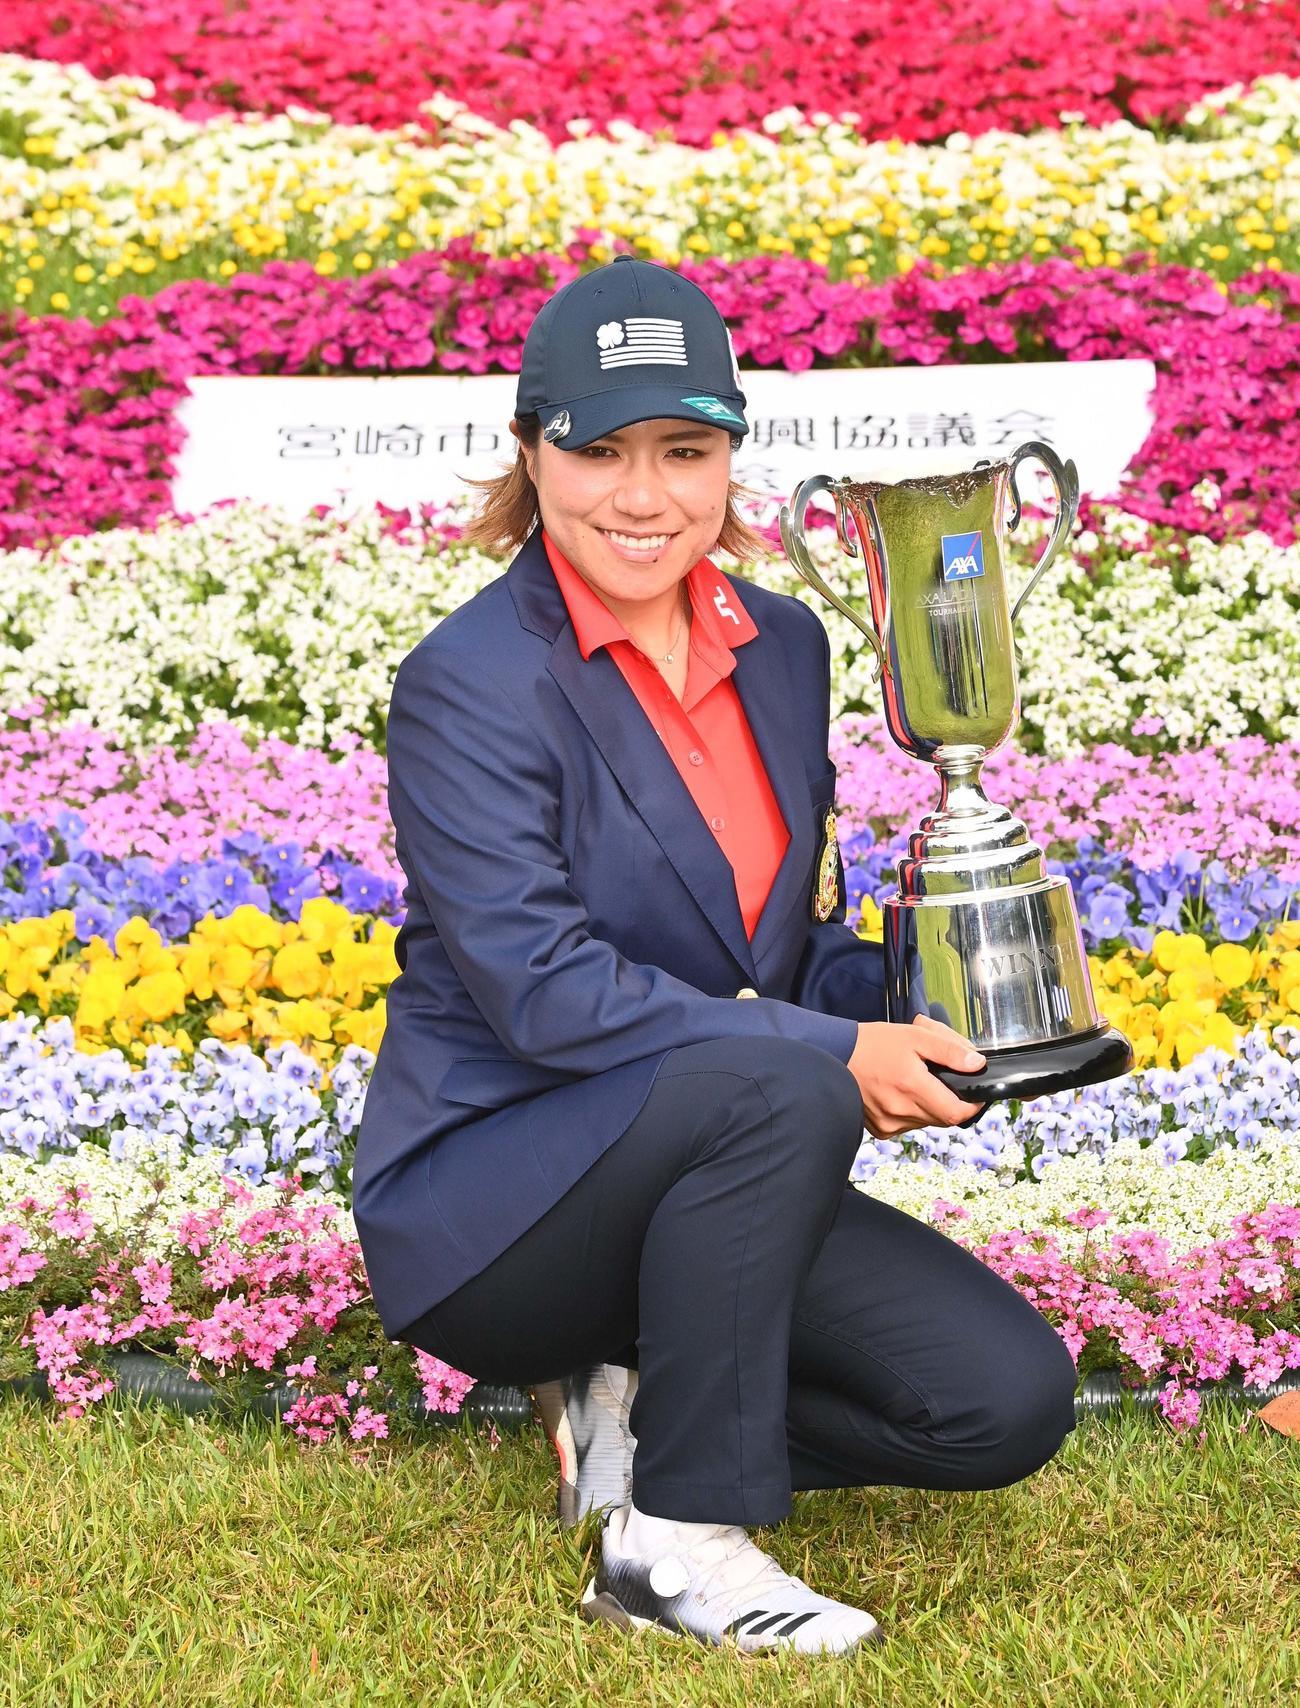 https://www.nikkansports.com/sports/golf/news/img/202103280000734-w1300_2.jpg